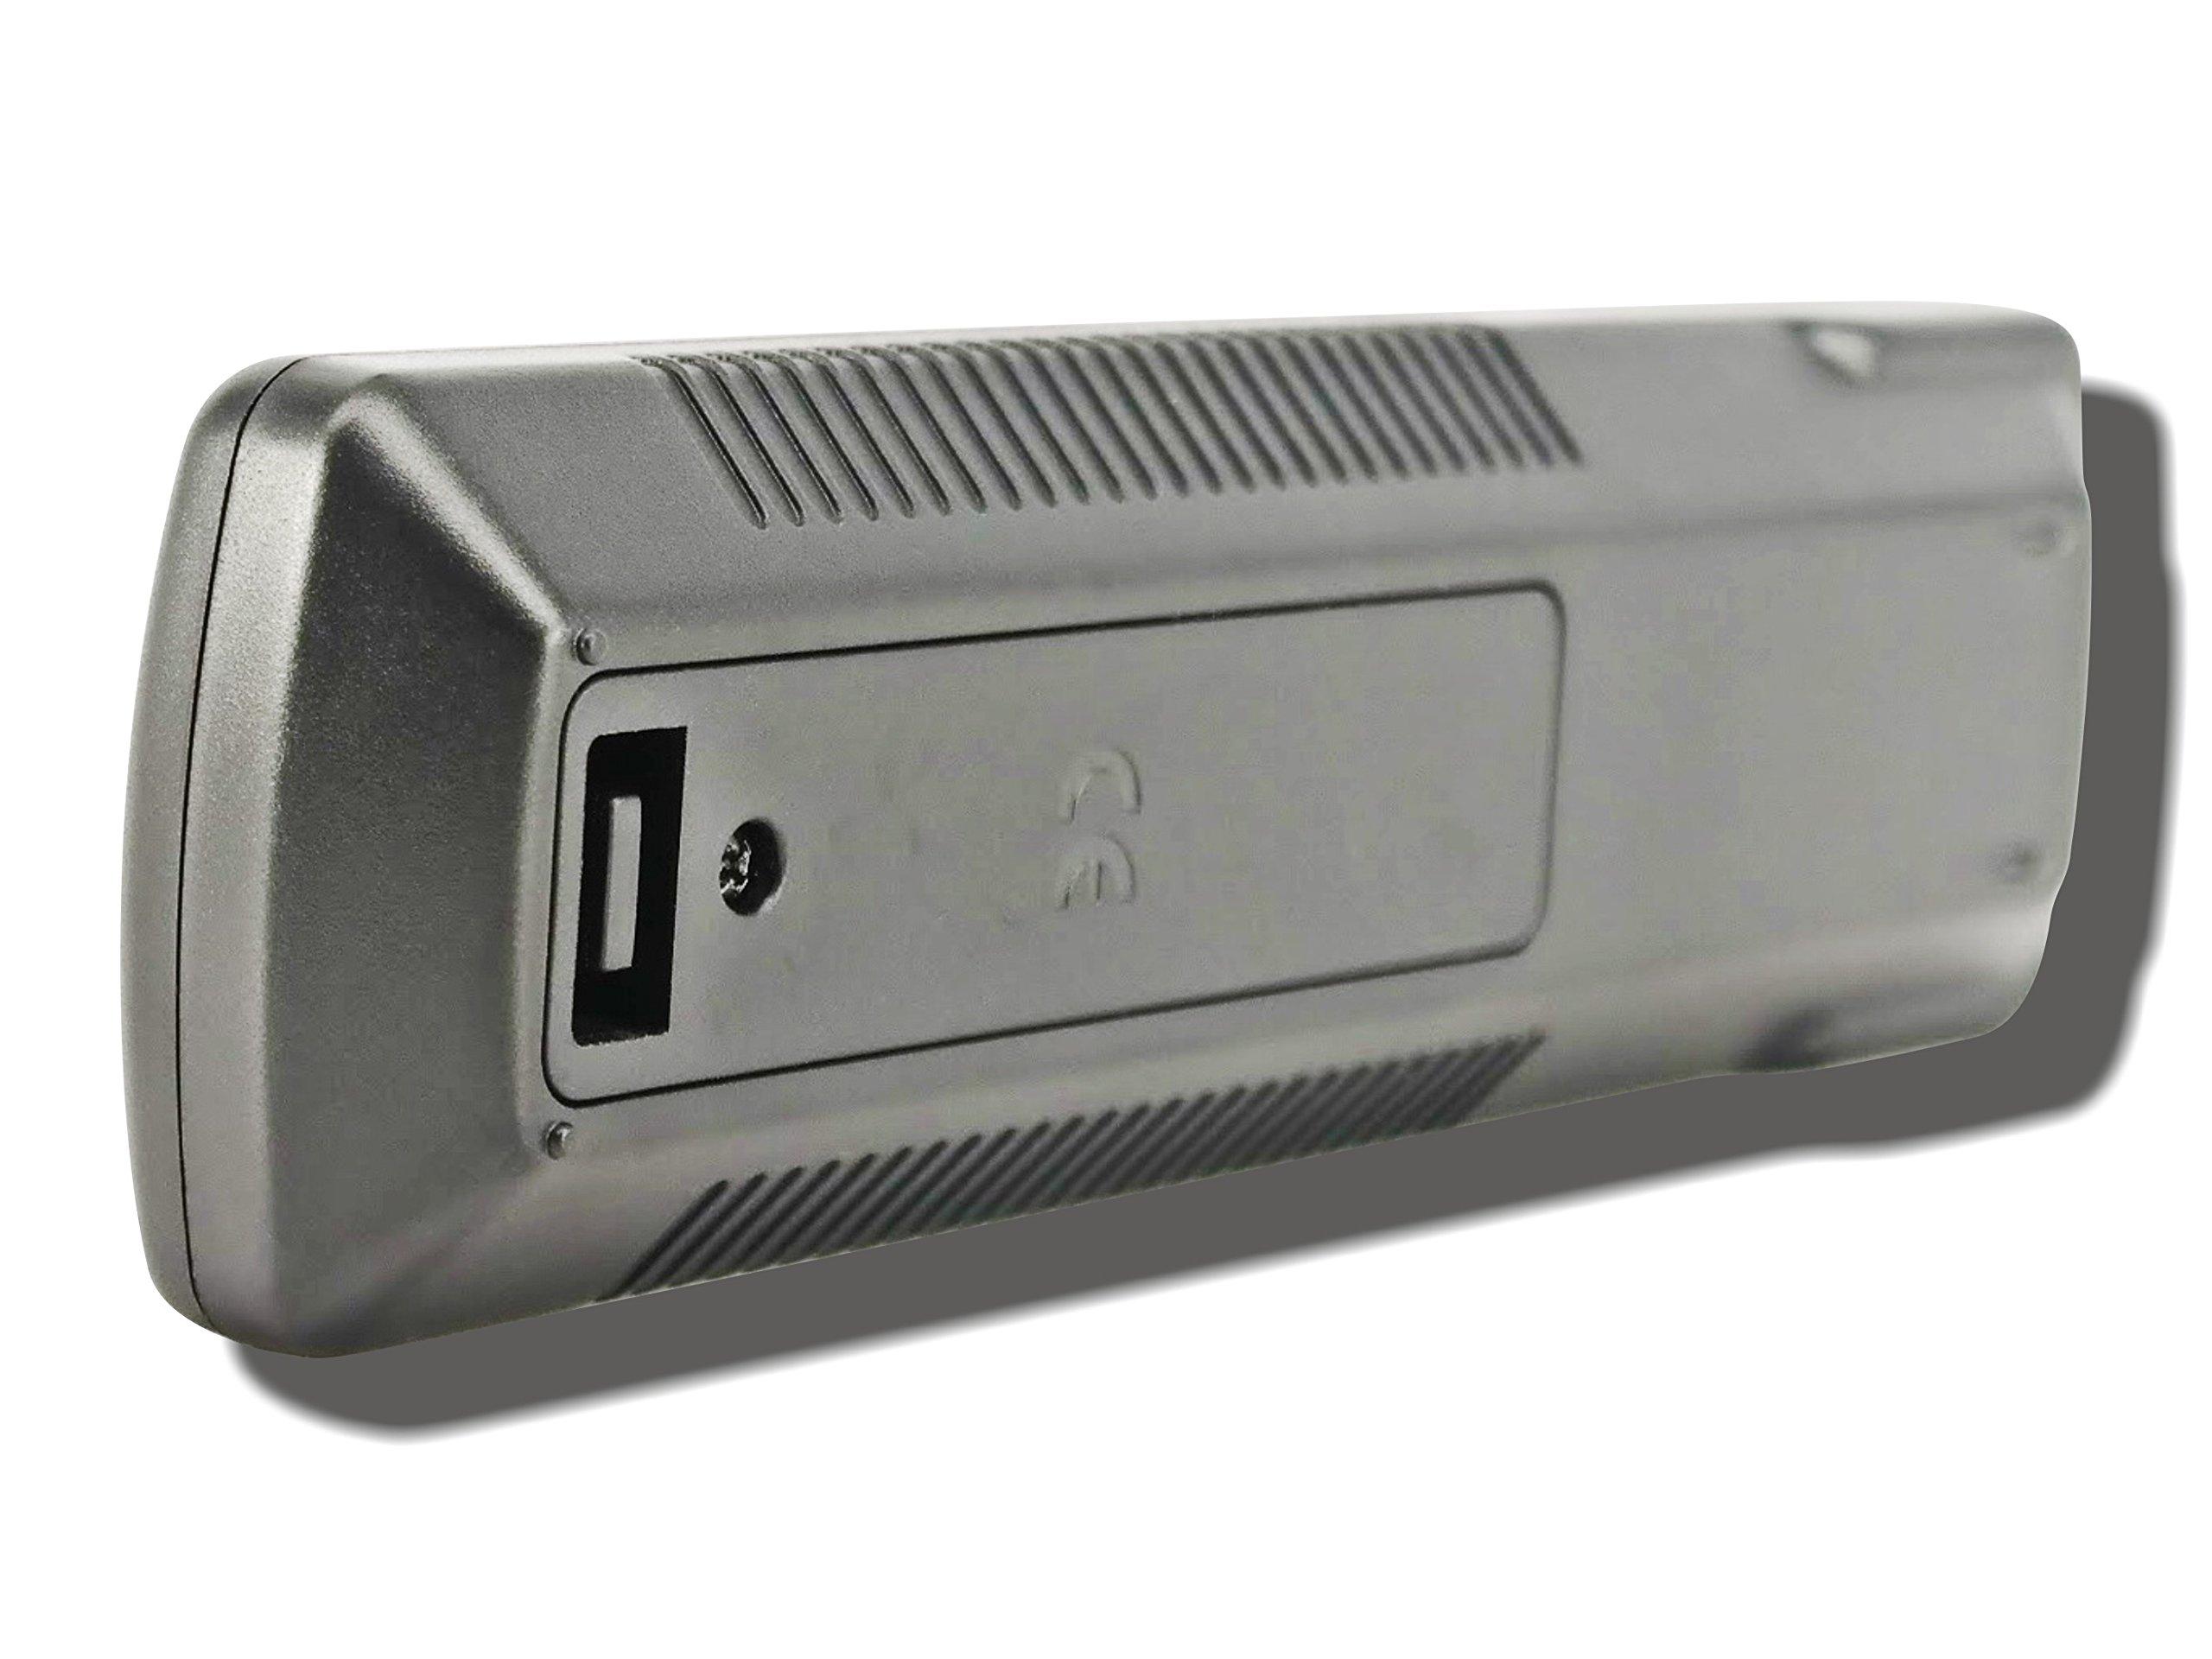 Sony DVP-CX995V TeKswamp Remote Control (Black) by Tekswamp (Image #6)